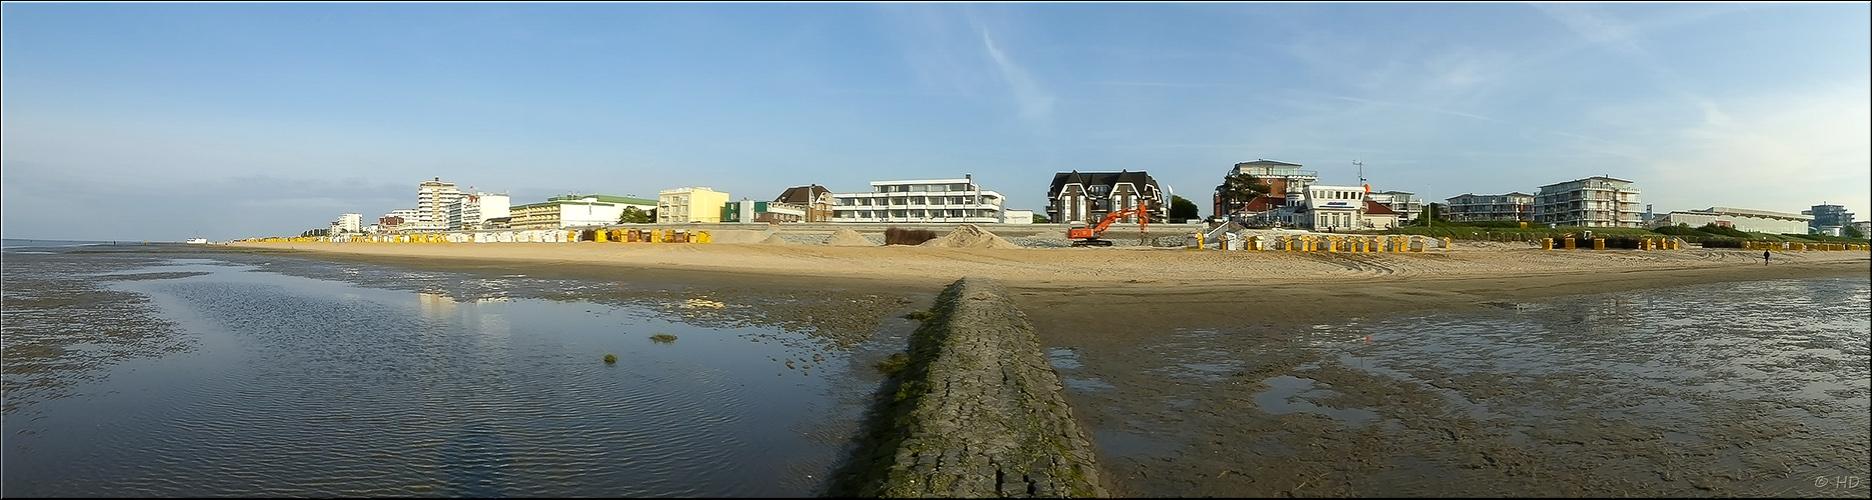 Blick auf den Strand....